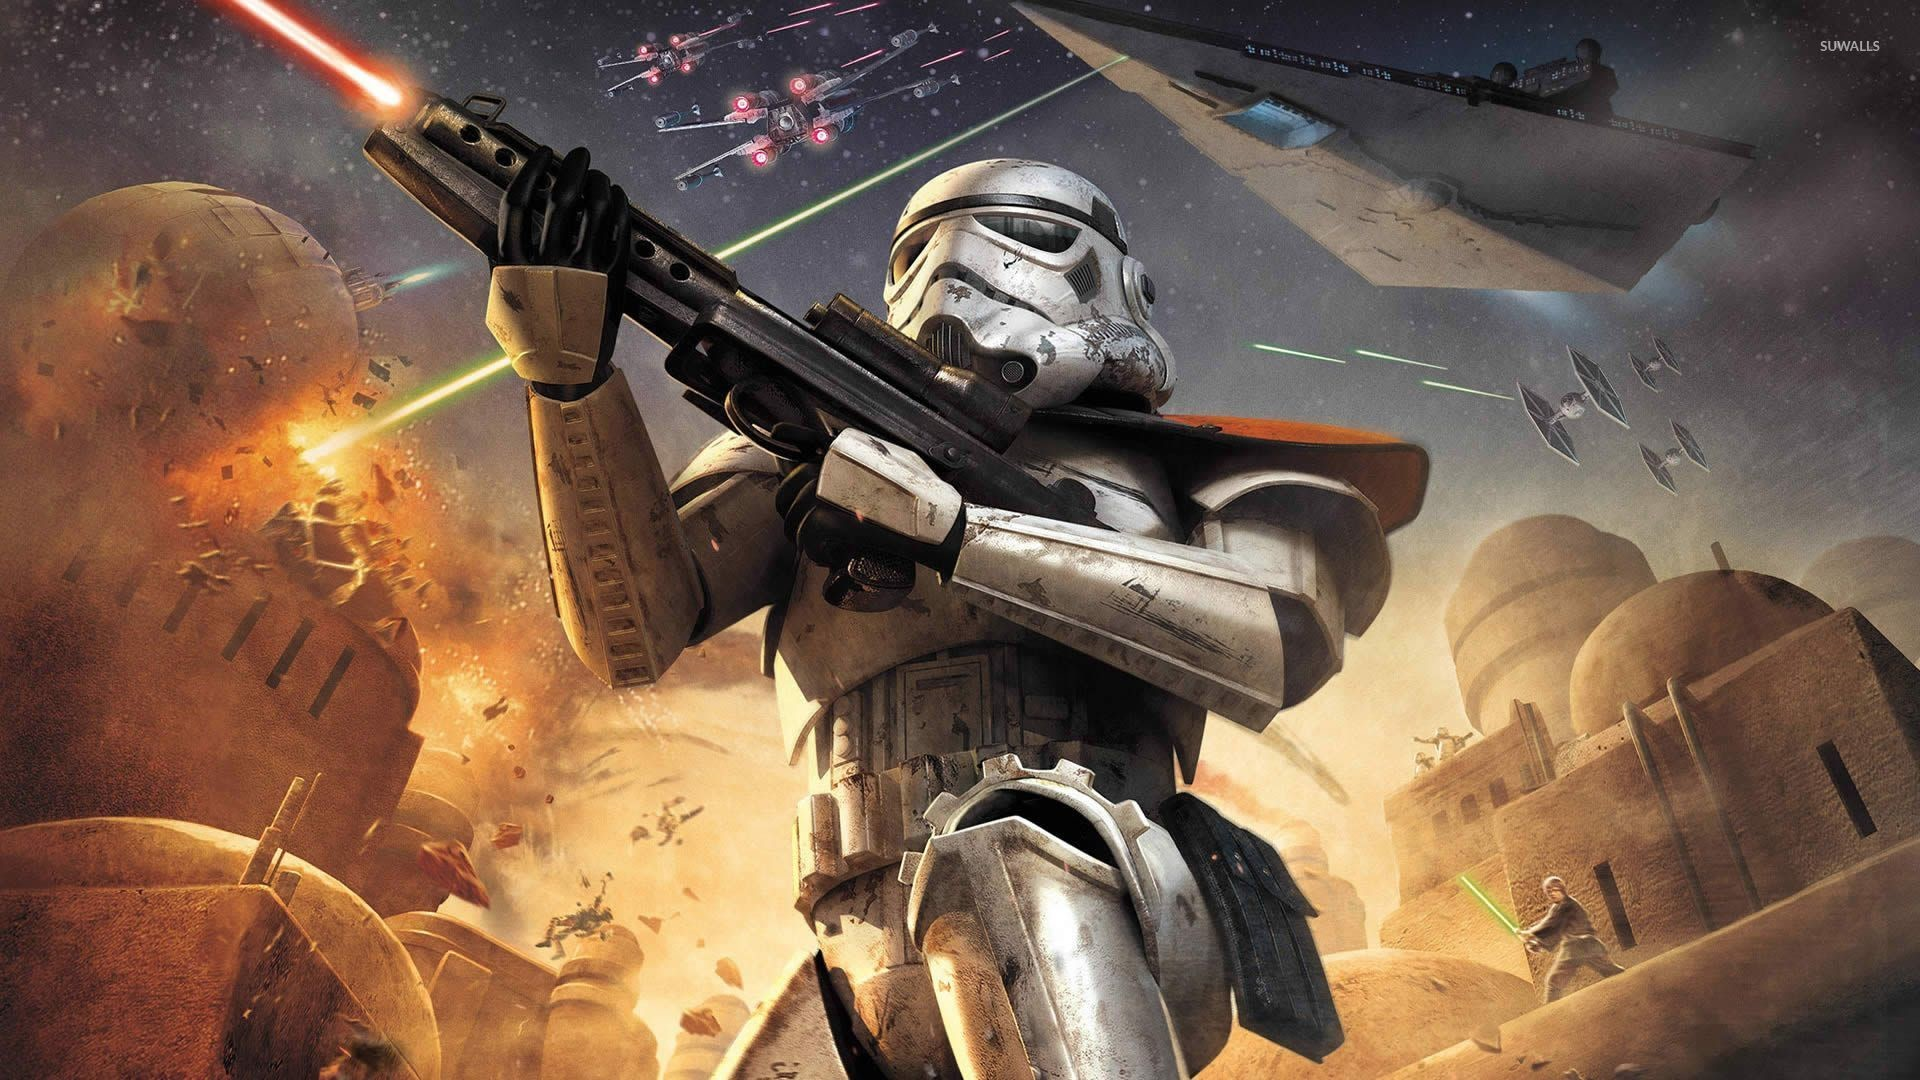 Star Wars Battlefront Star Wars Stormtrooper Art 1920x1080 Download Hd Wallpaper Wallpapertip